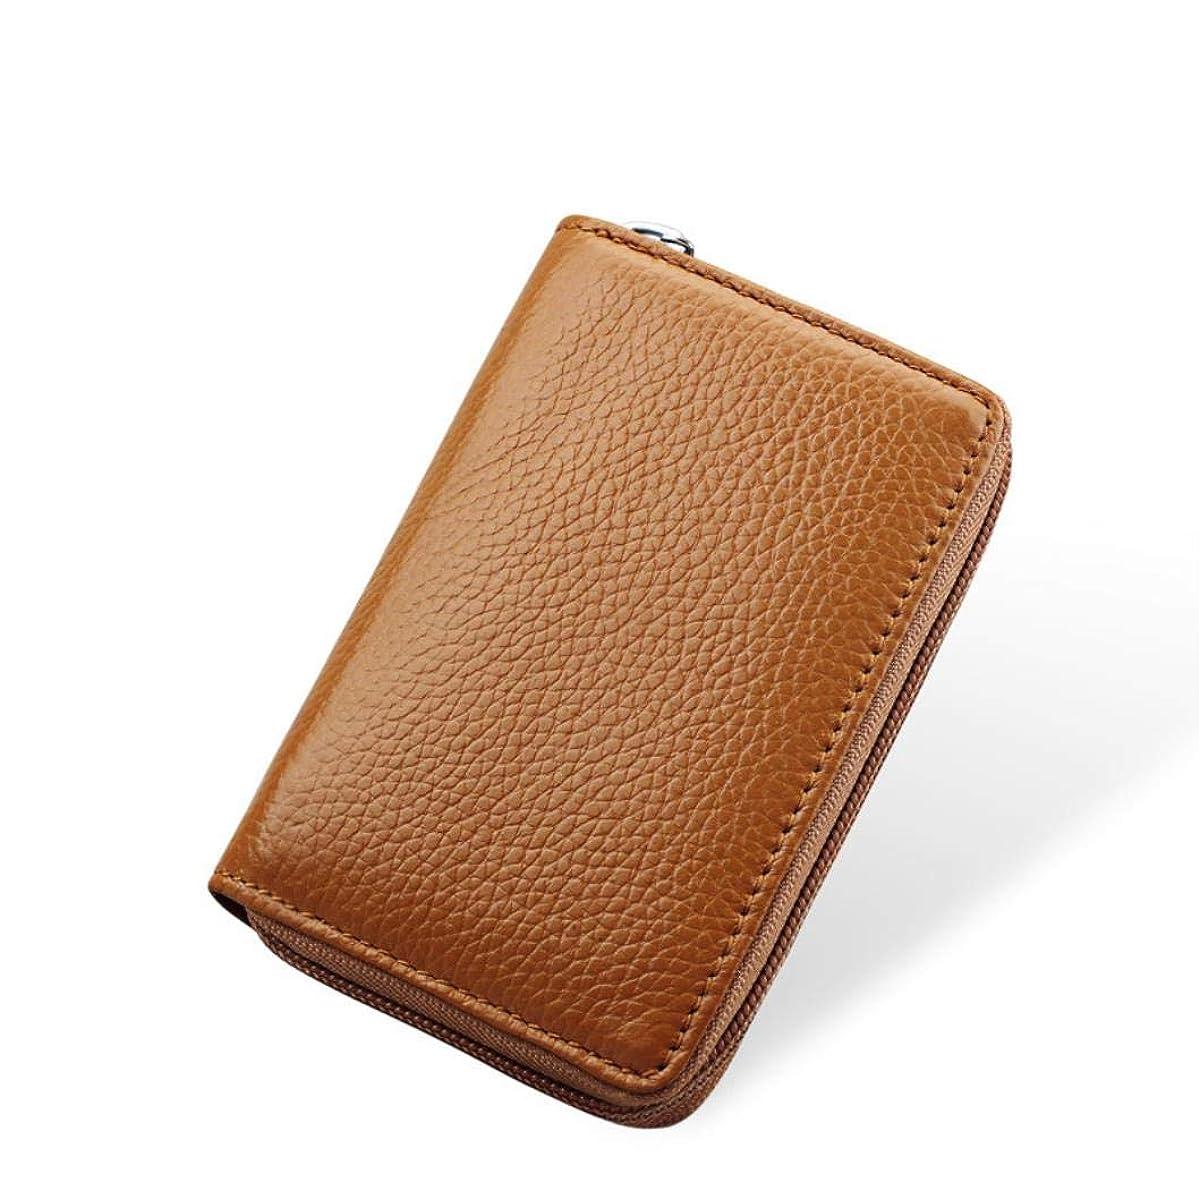 Business Men Card Pack Real Leather CardHolder Zipper Credit Card Holder By 26 Slots